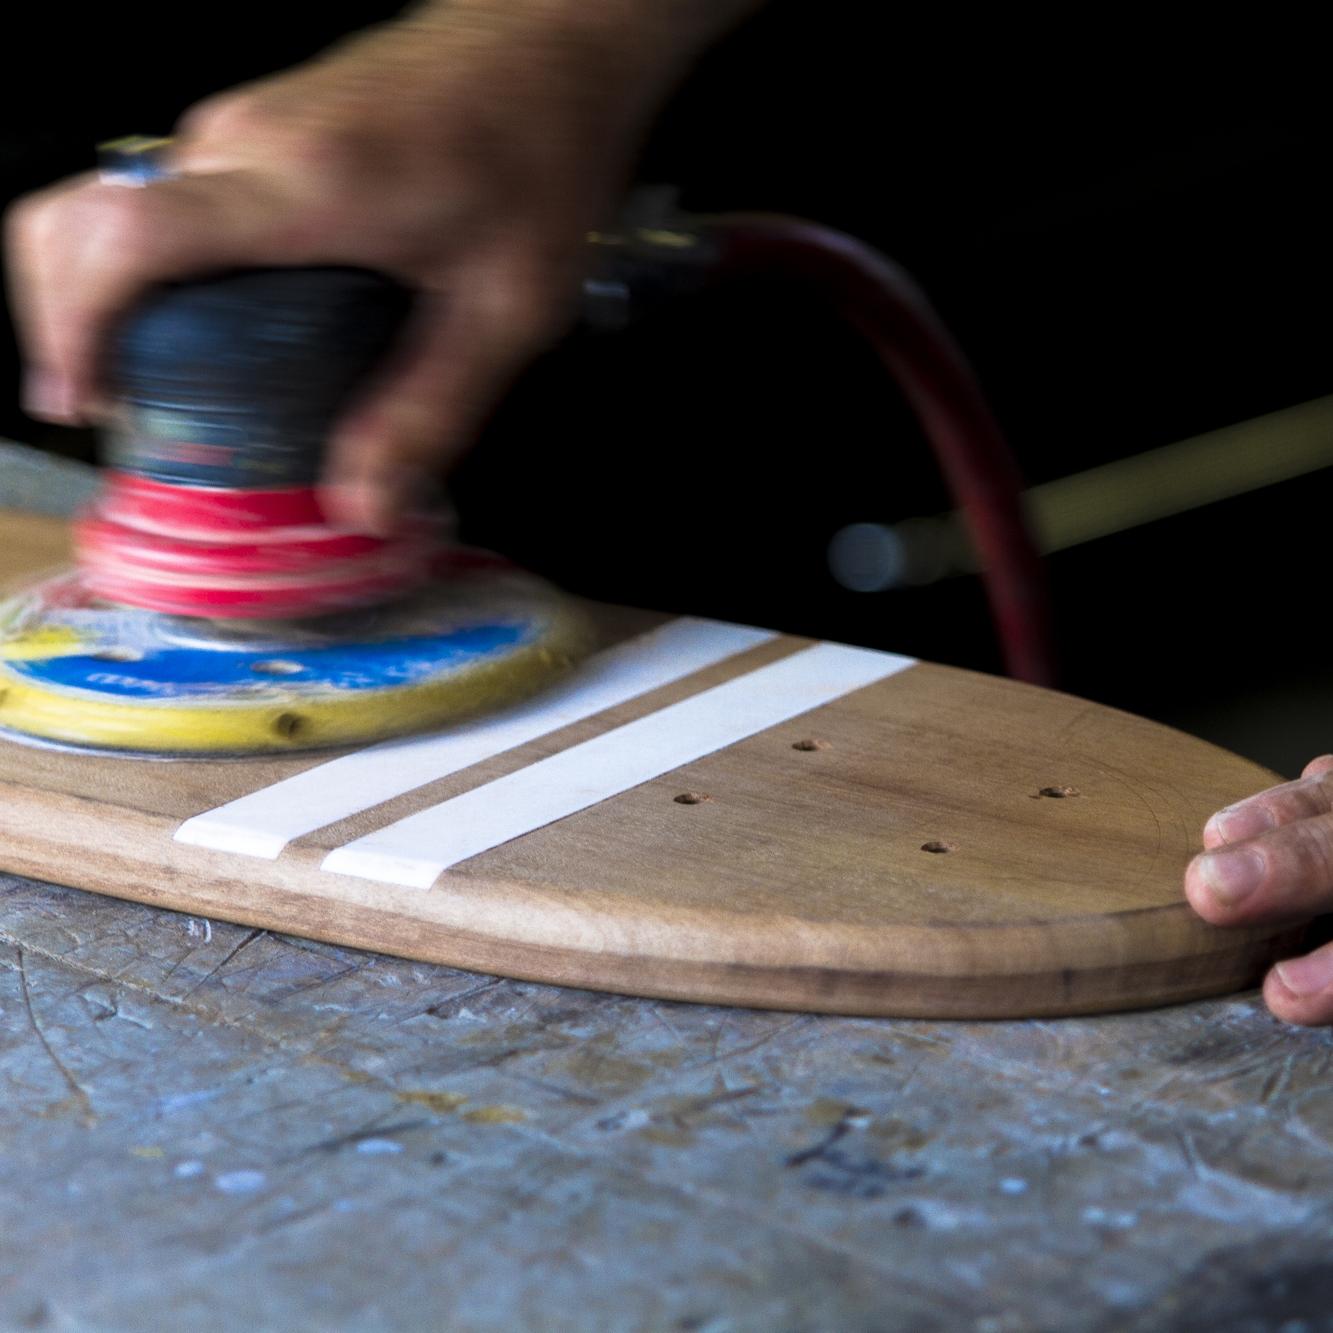 Worthy_skateboards_Samuel_Wiles_16.jpg